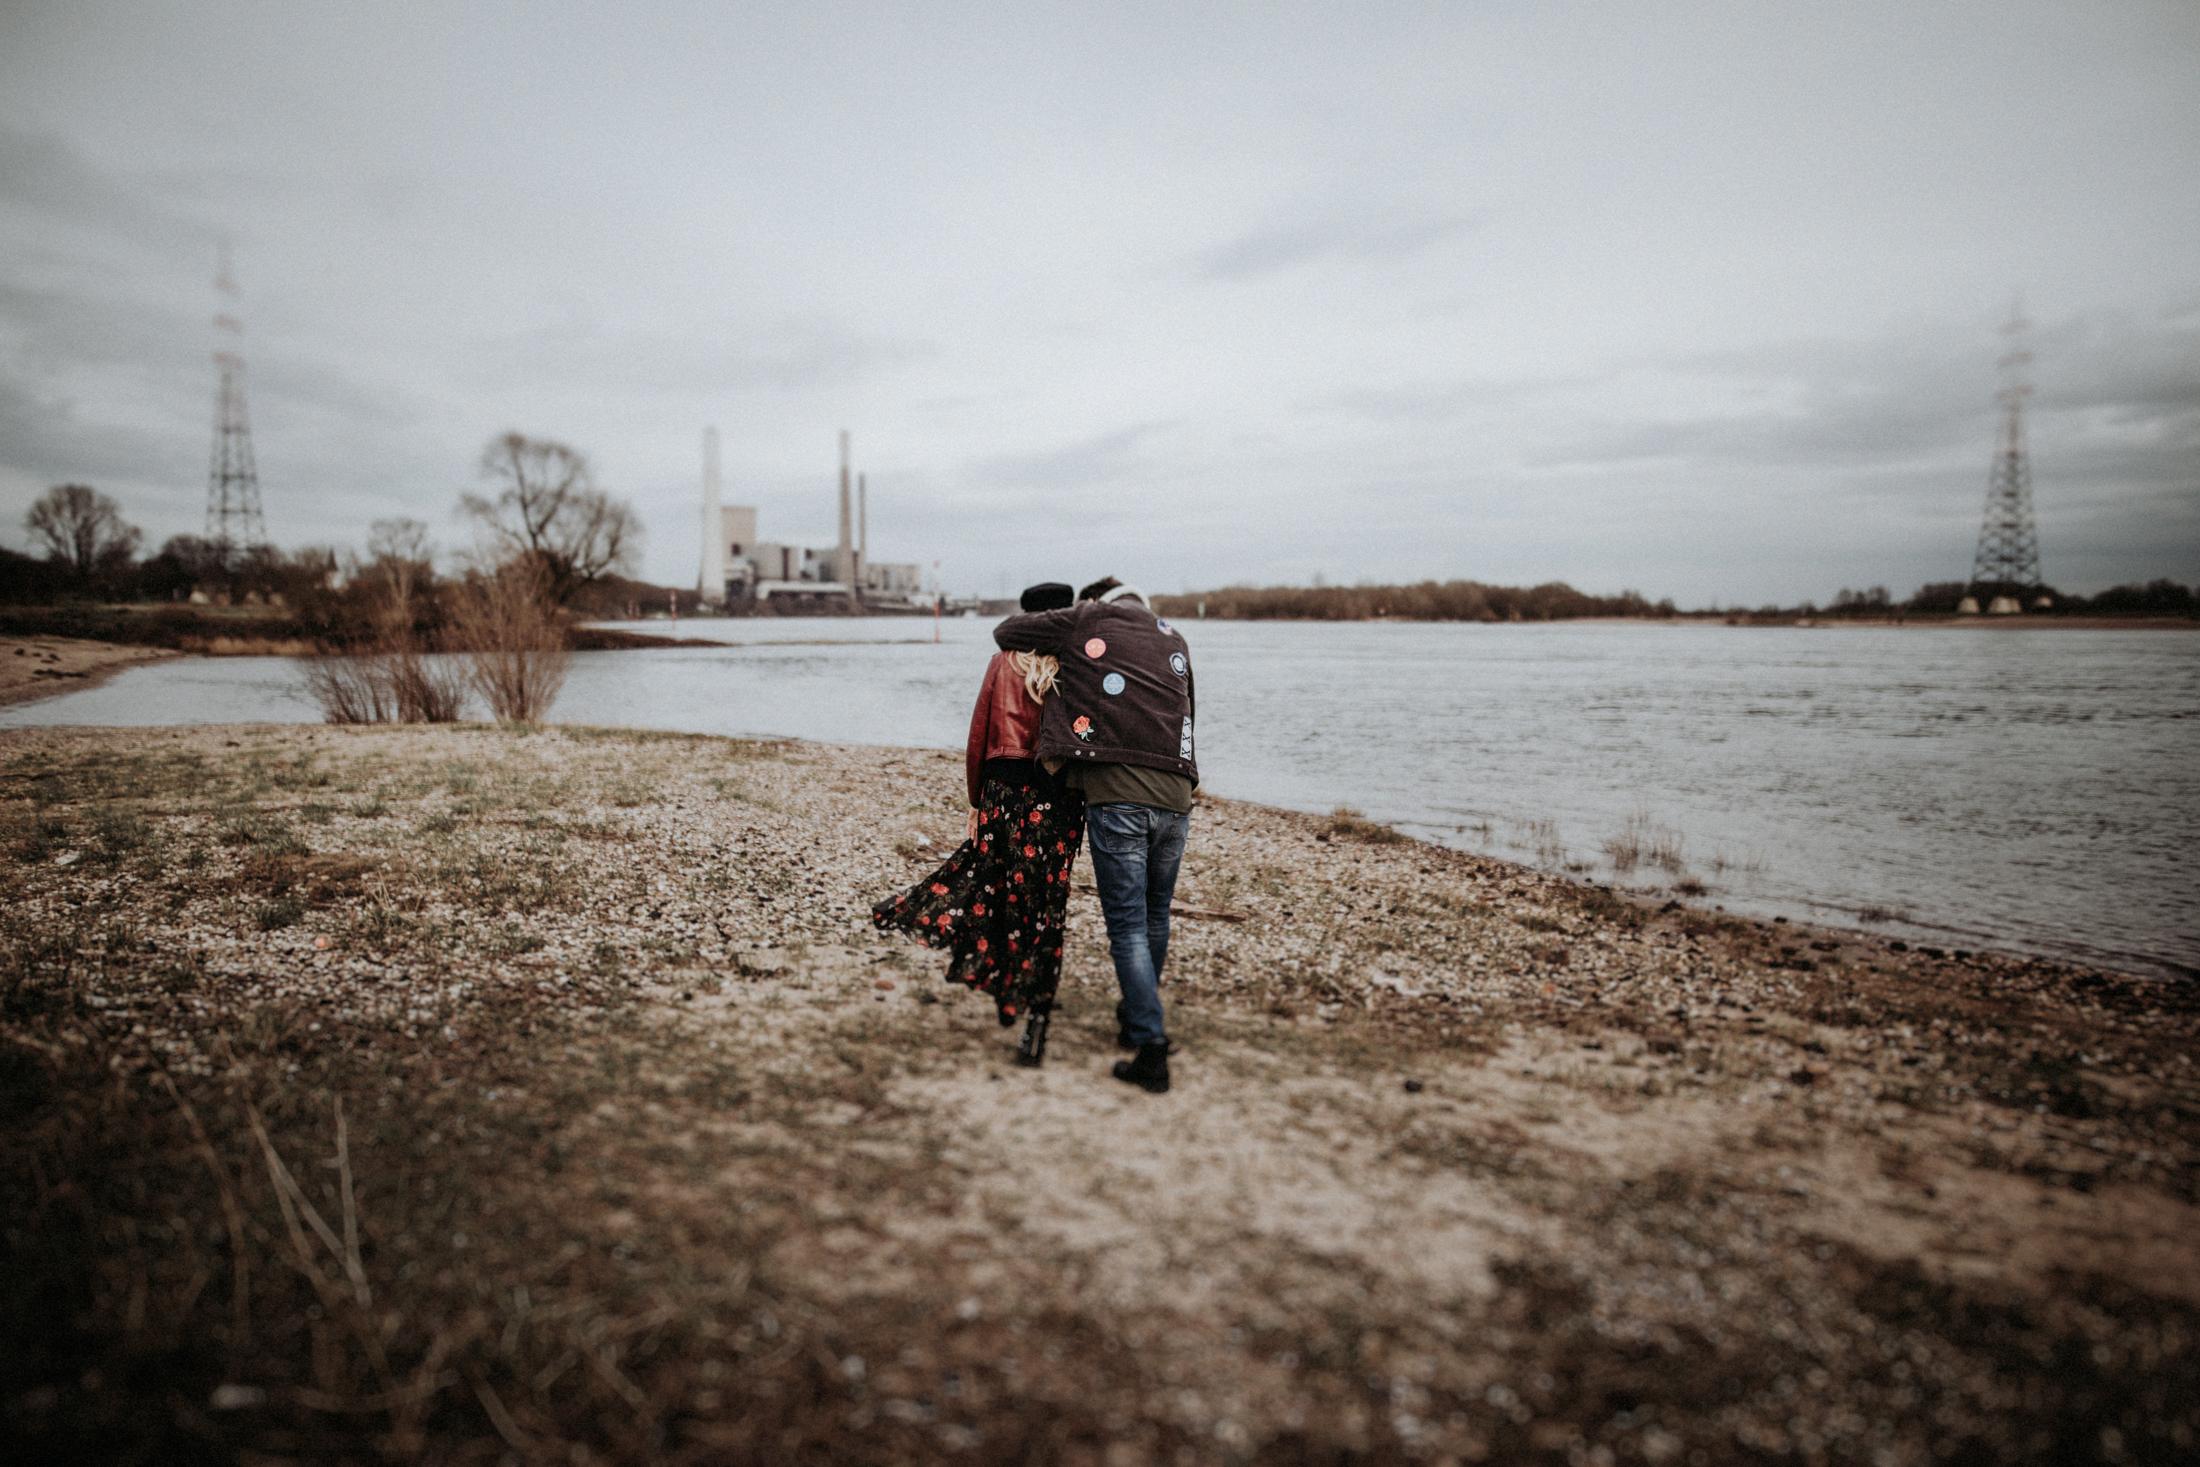 Wedding_Photographer_Mallorca_DanielaMarquardt_Photography_CanaryIslands_Lanzarote_Iceland_Tuscany_Santorini_Portugal_NewYork_Spain_Elopement_Hochzeitsfotograf_CK124